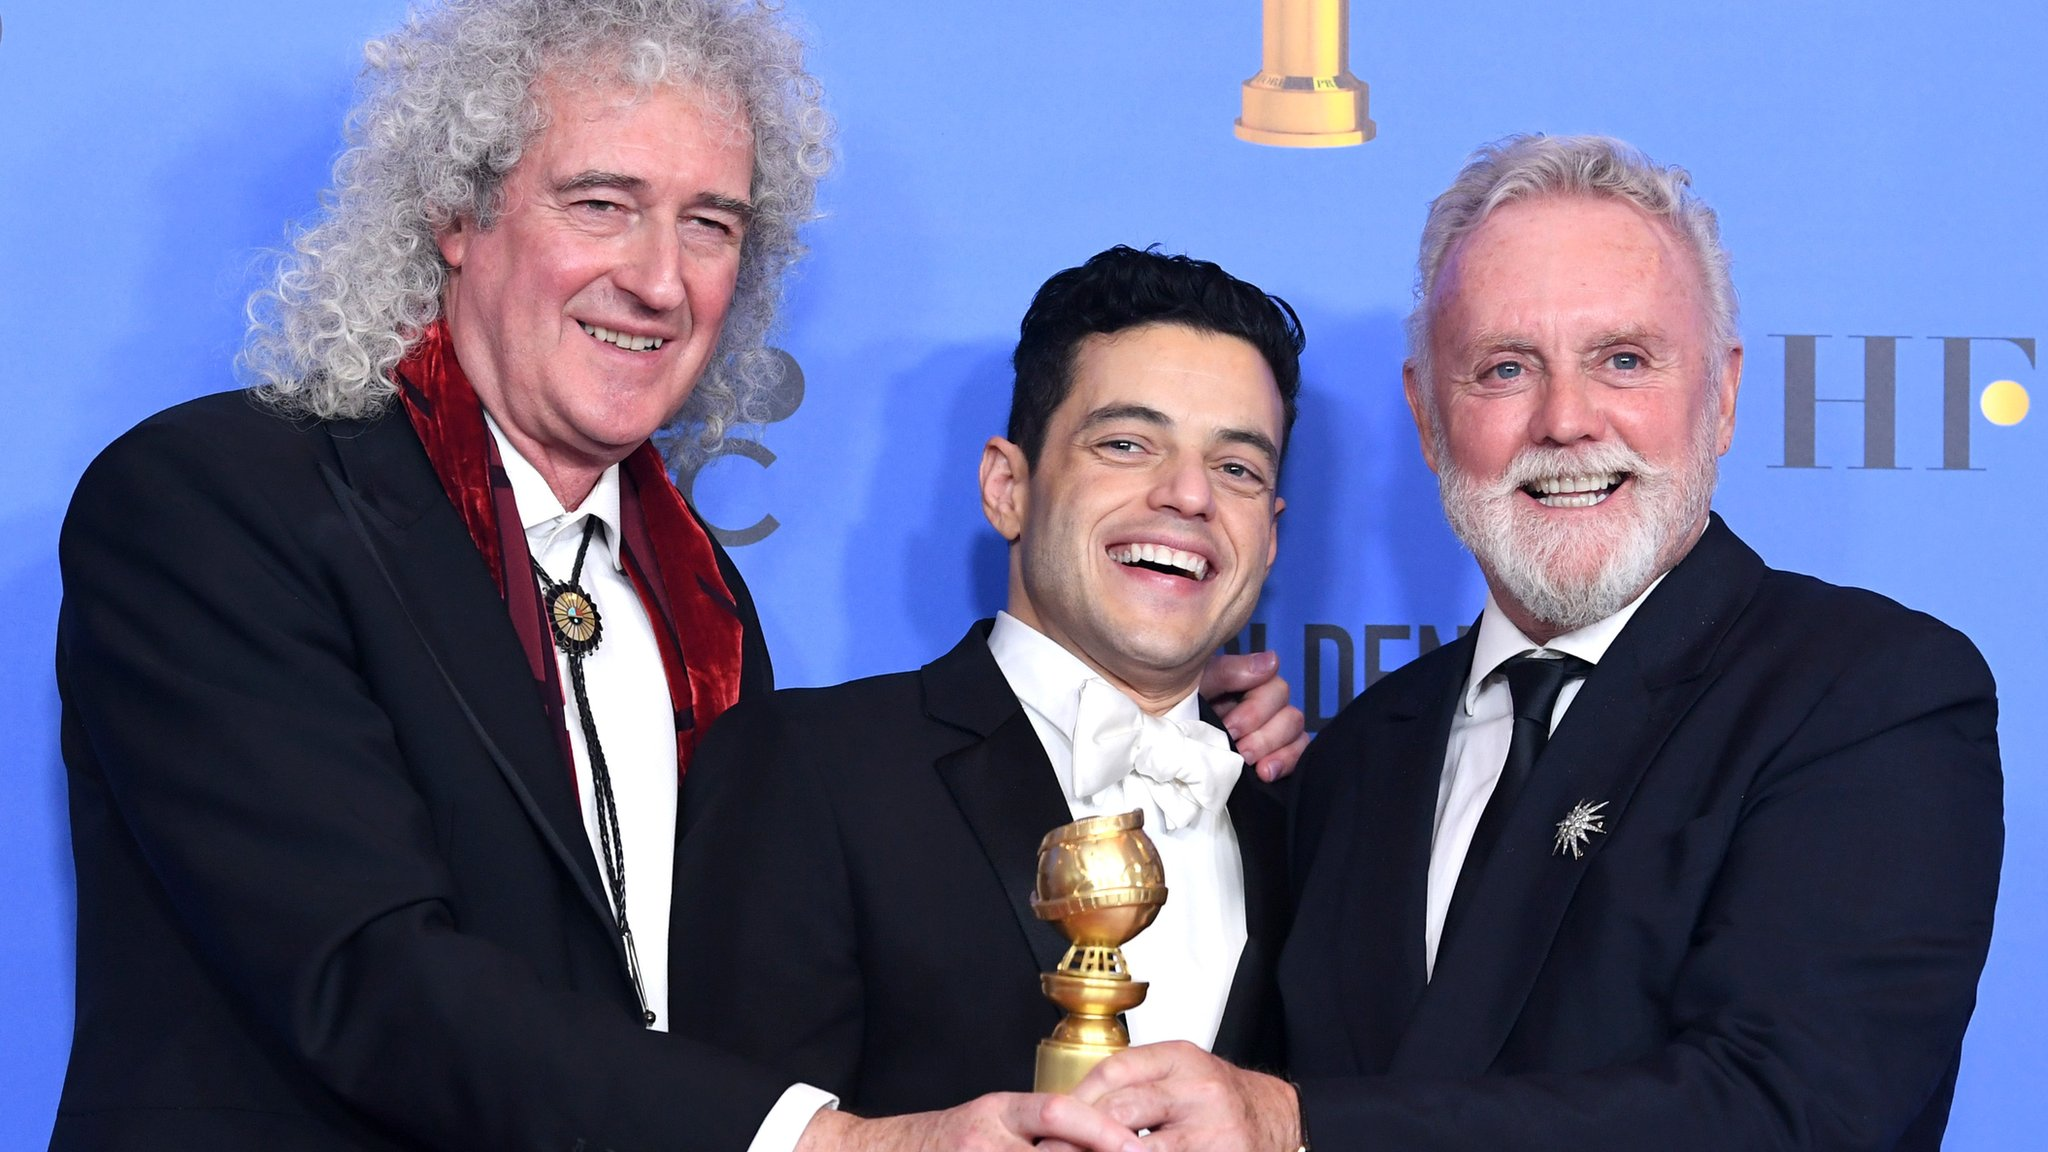 Every 2019 Golden Globe Award-Winning Movie